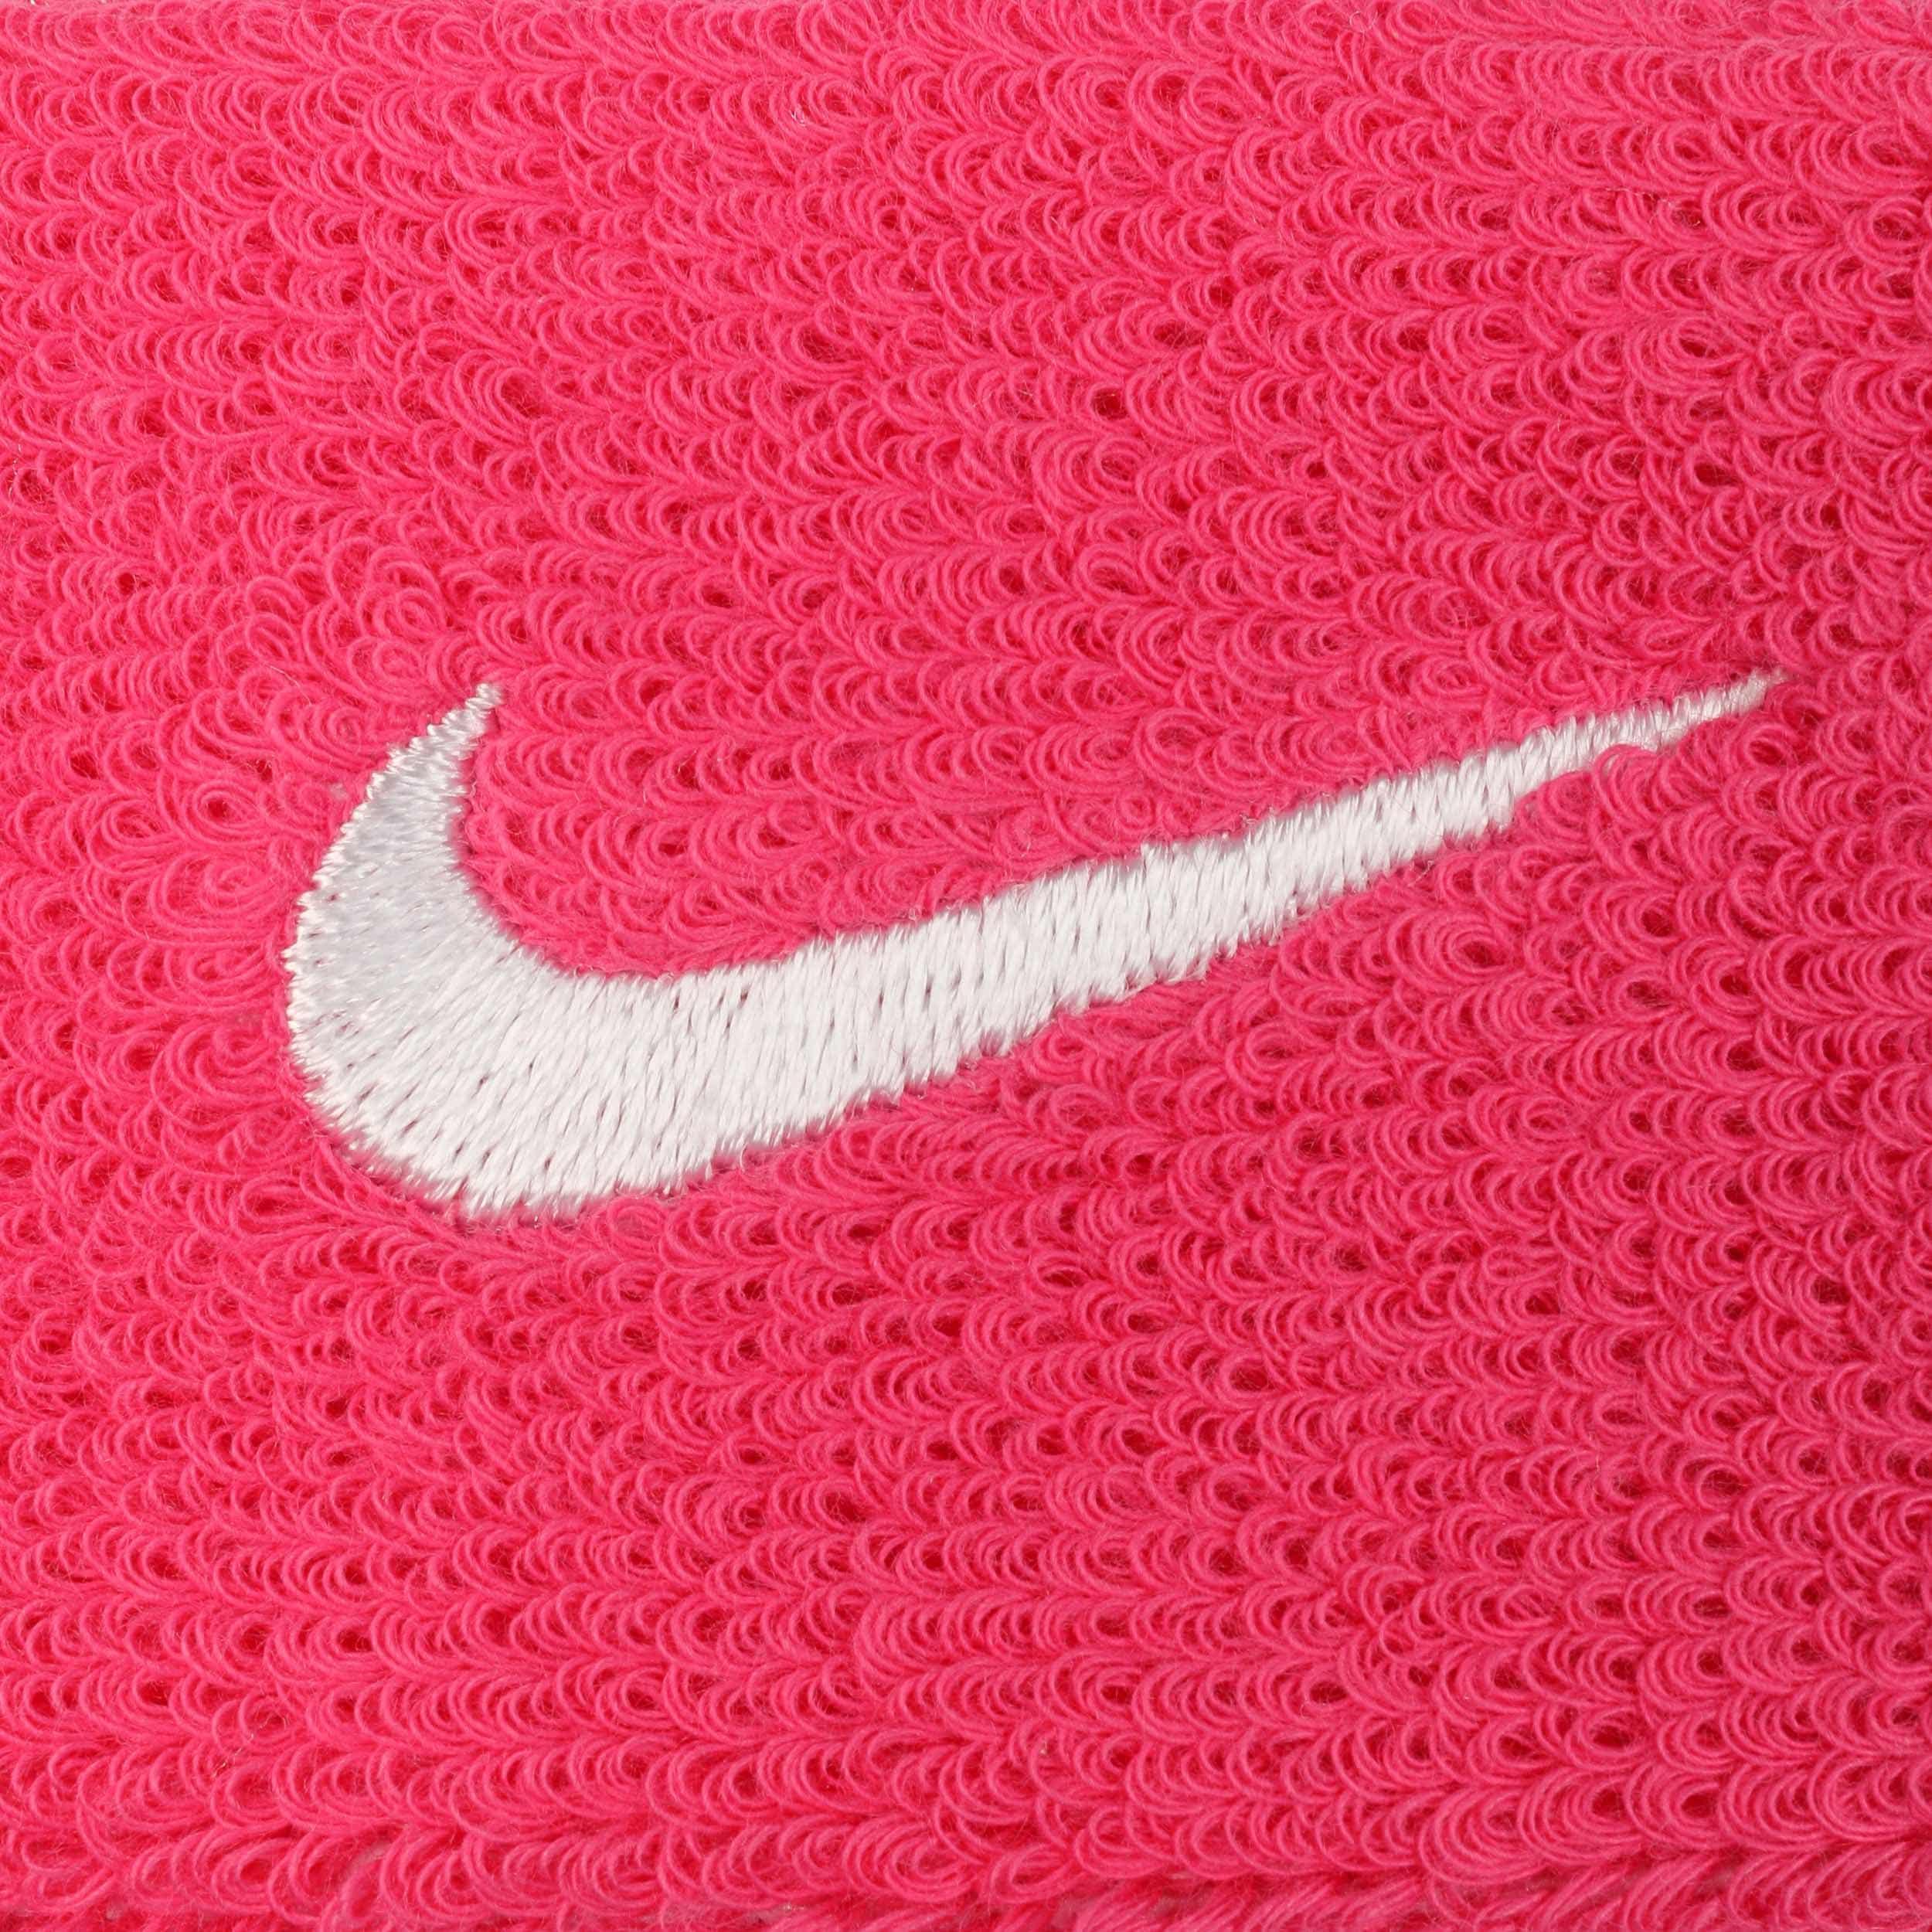 ... Swoosh Headband by Nike - pink 1 ... 32823ce6558